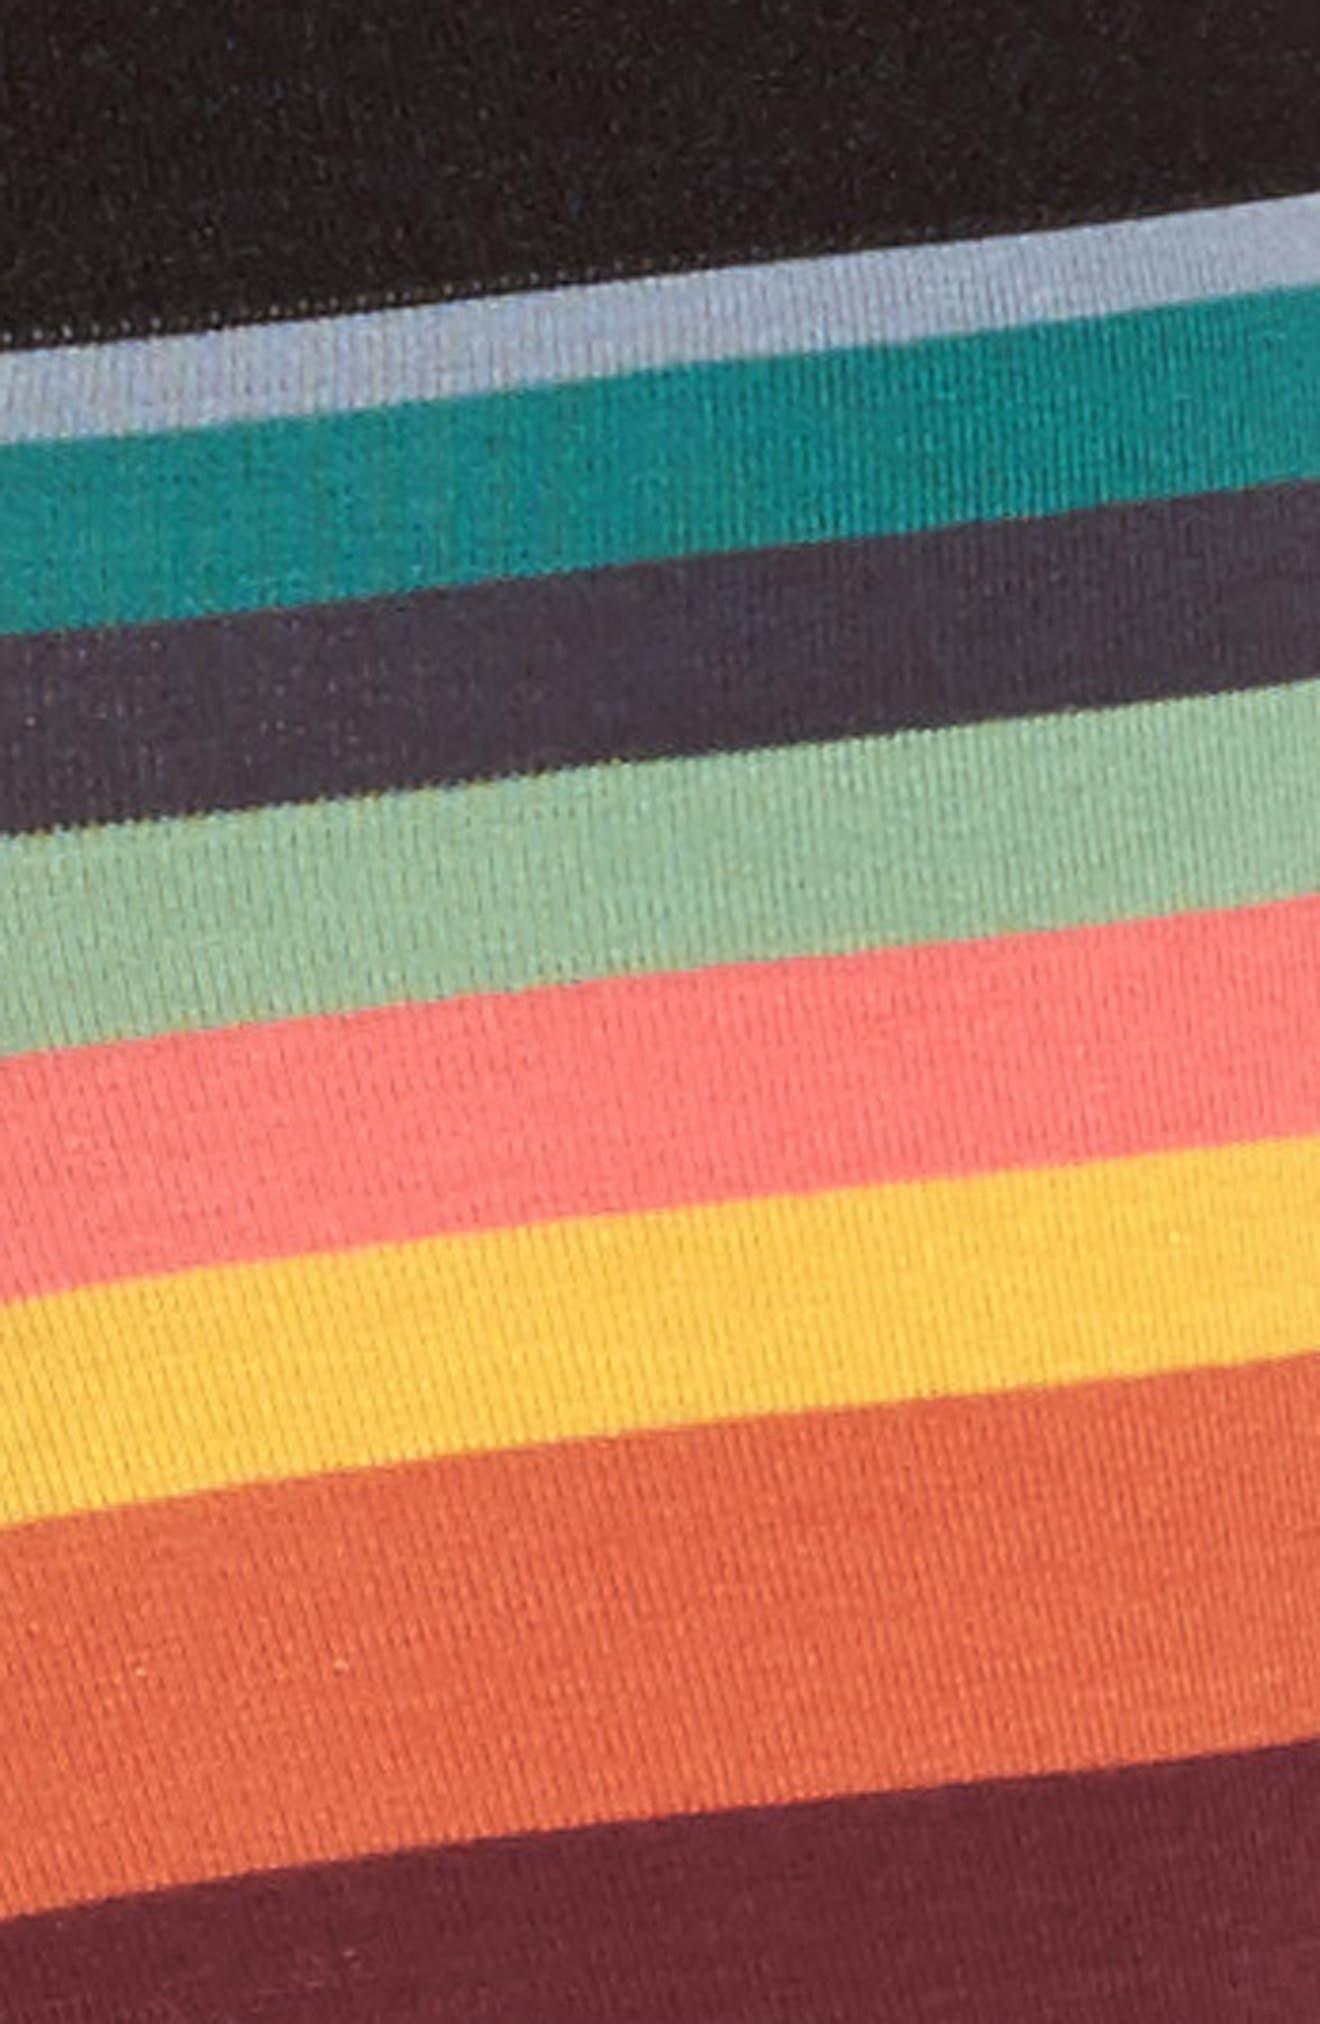 3-Pack Assorted Square Cut Trunks,                             Alternate thumbnail 5, color,                             Black/ Multi Stripe